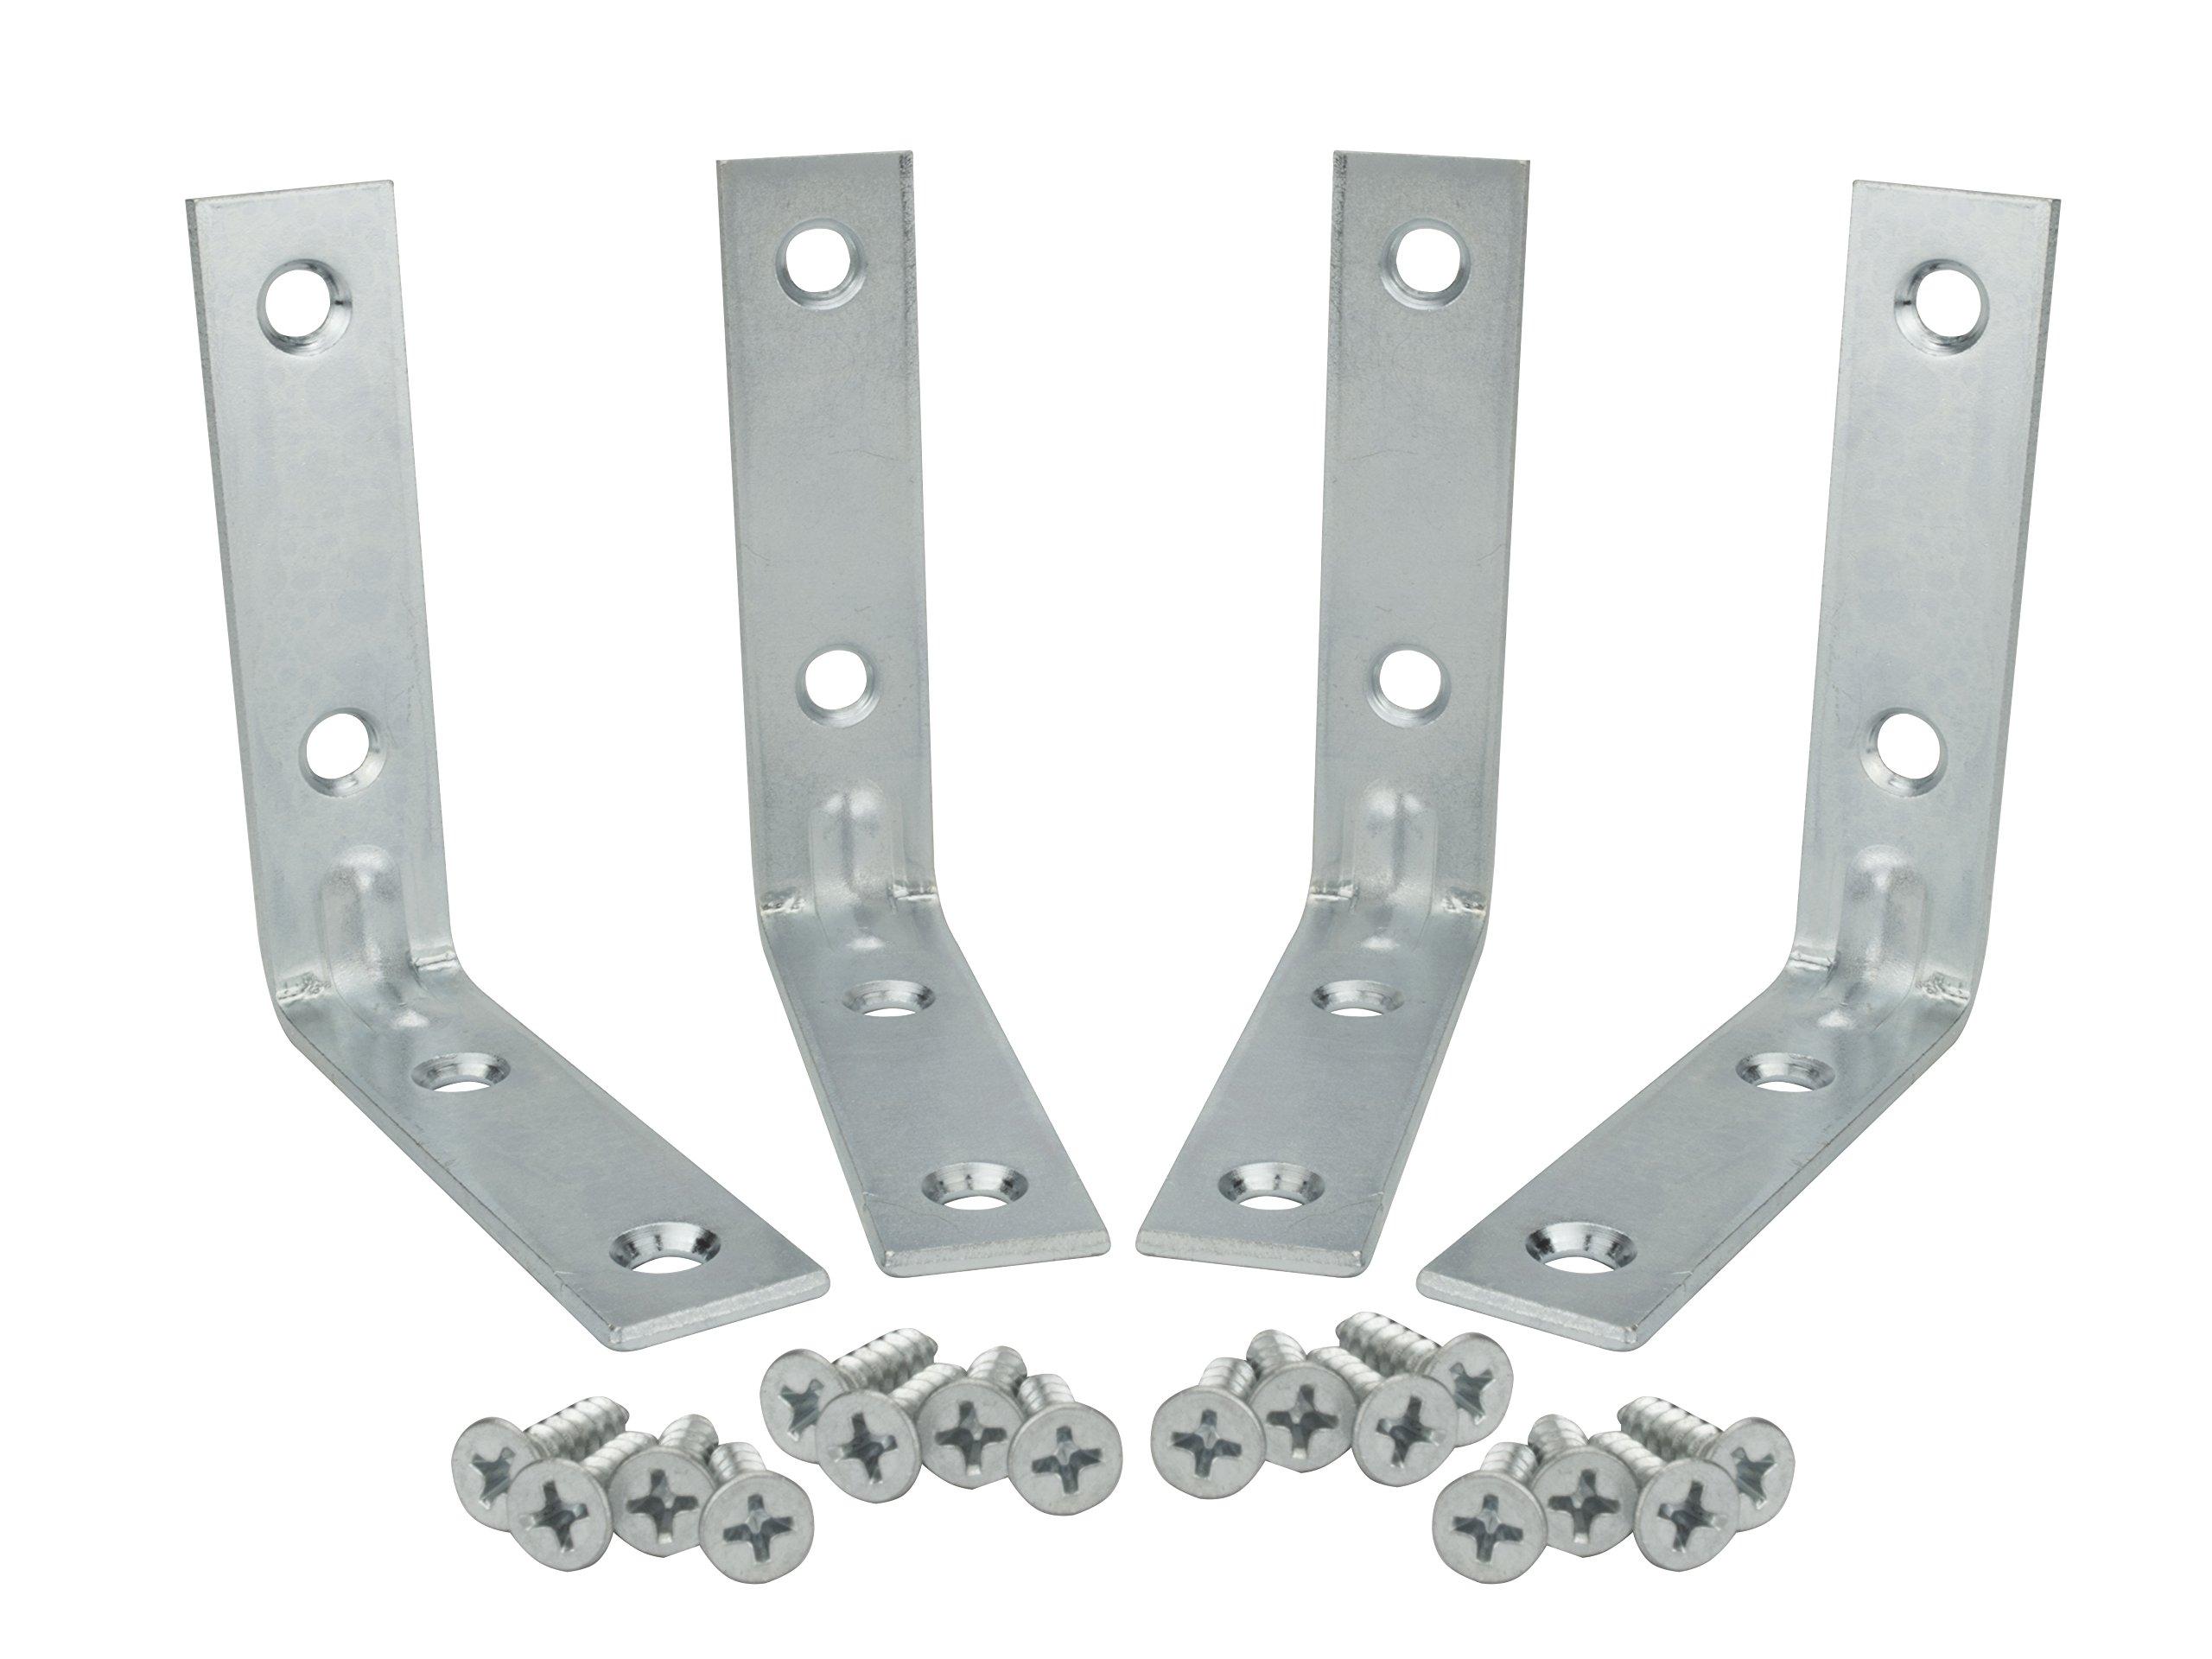 Specialty Hardware Corner Brace 3 inch Zinc Plated 120pcs